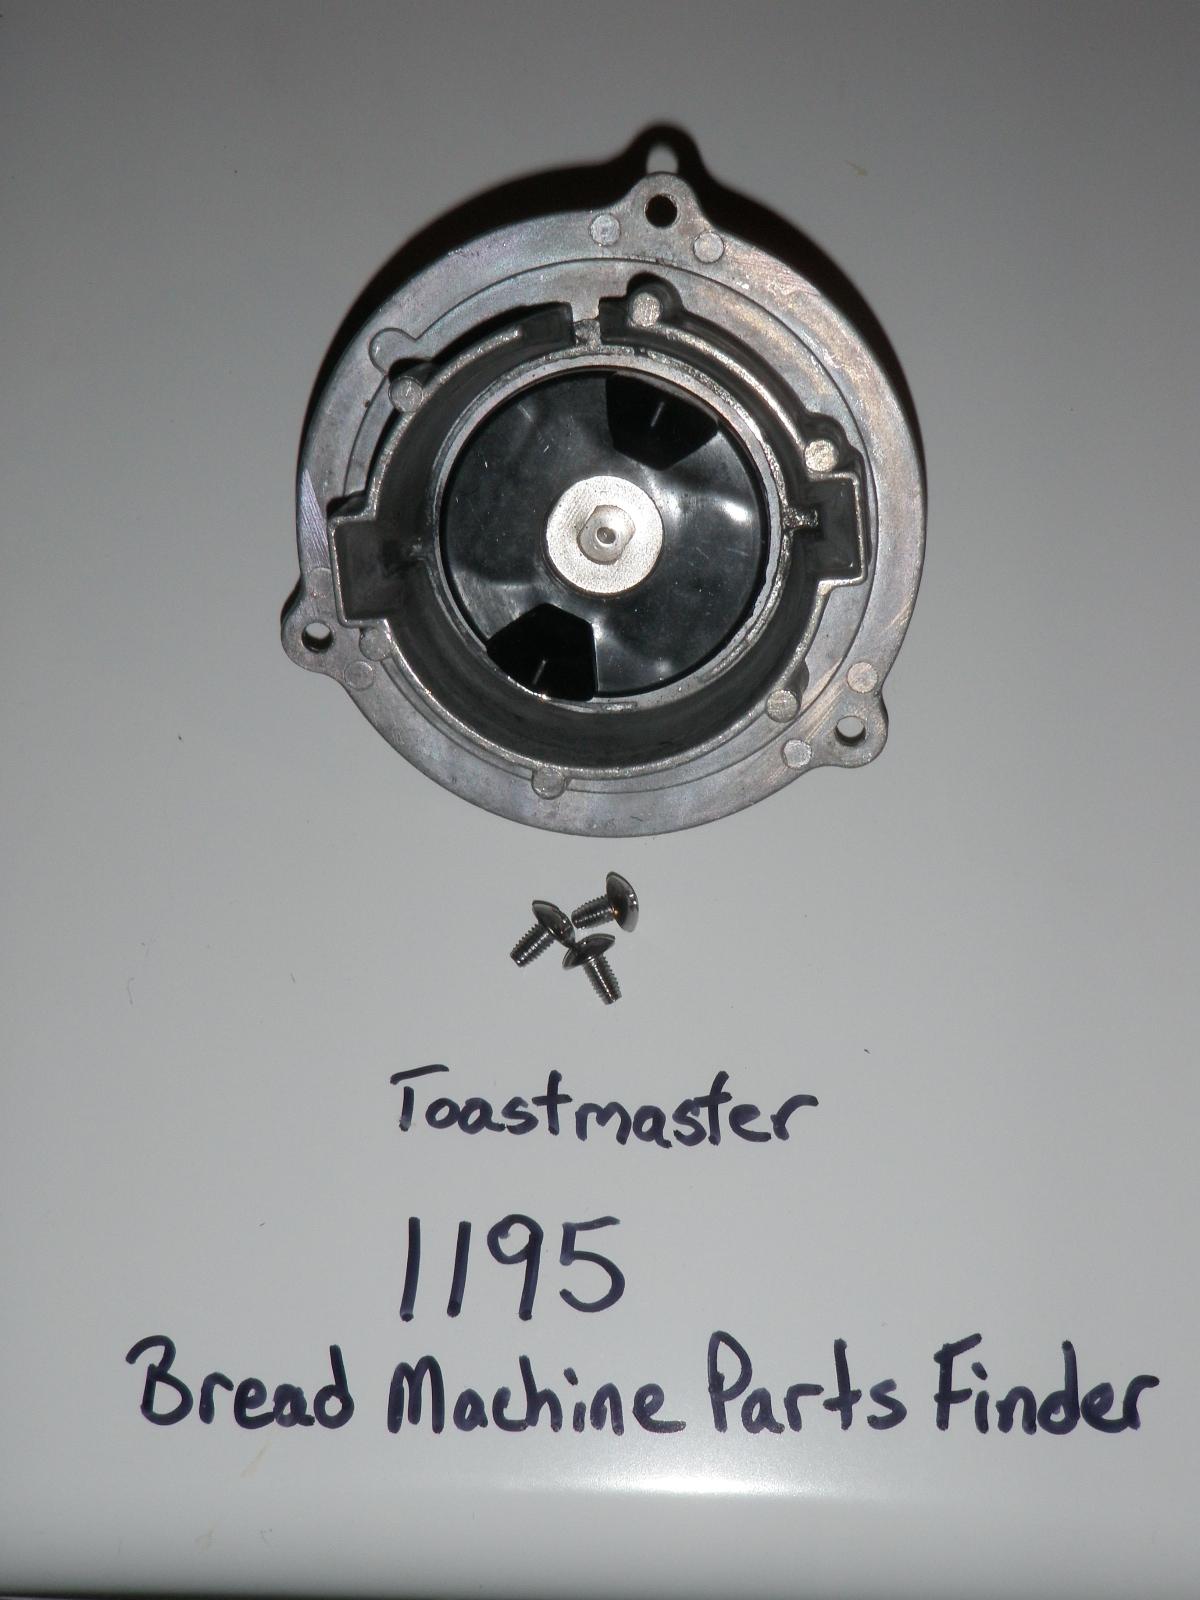 toastmaster bread machine model 1195